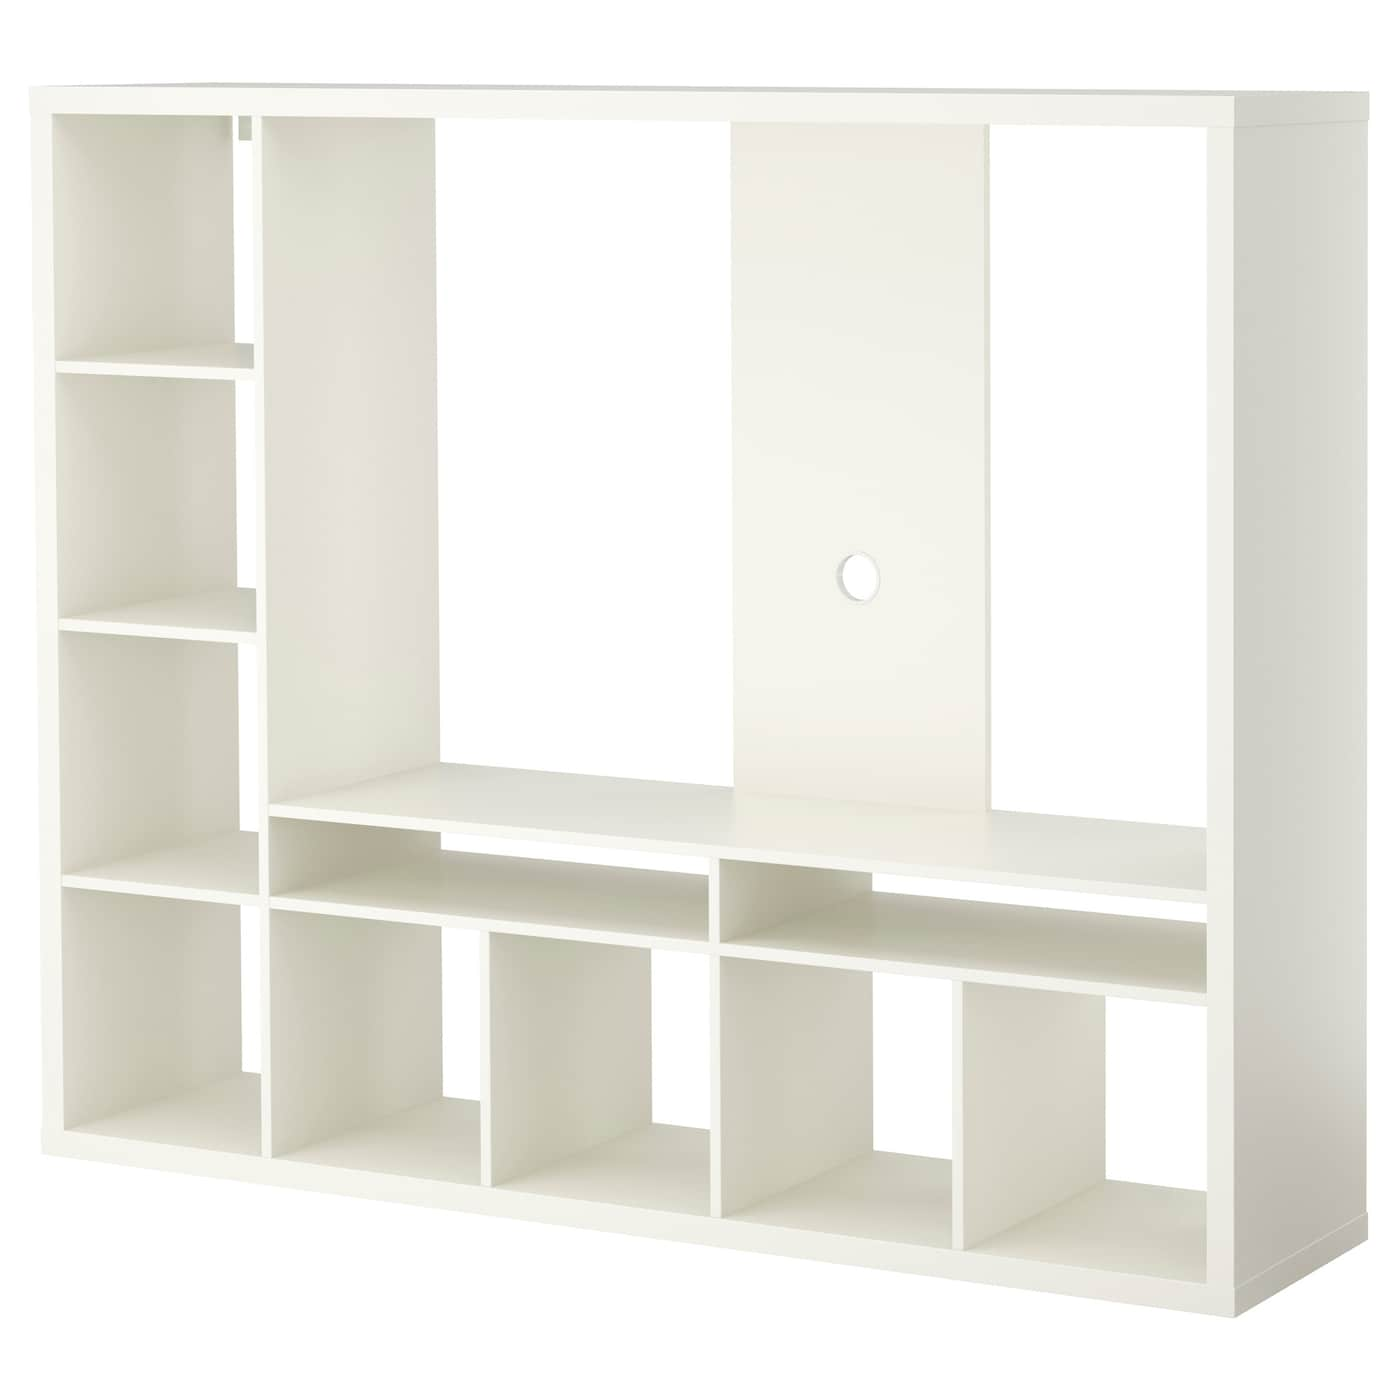 Lappland Meuble Tv Blanc 183×147 Cm Ikea # Dimension Meubles Tv Ecran Plat